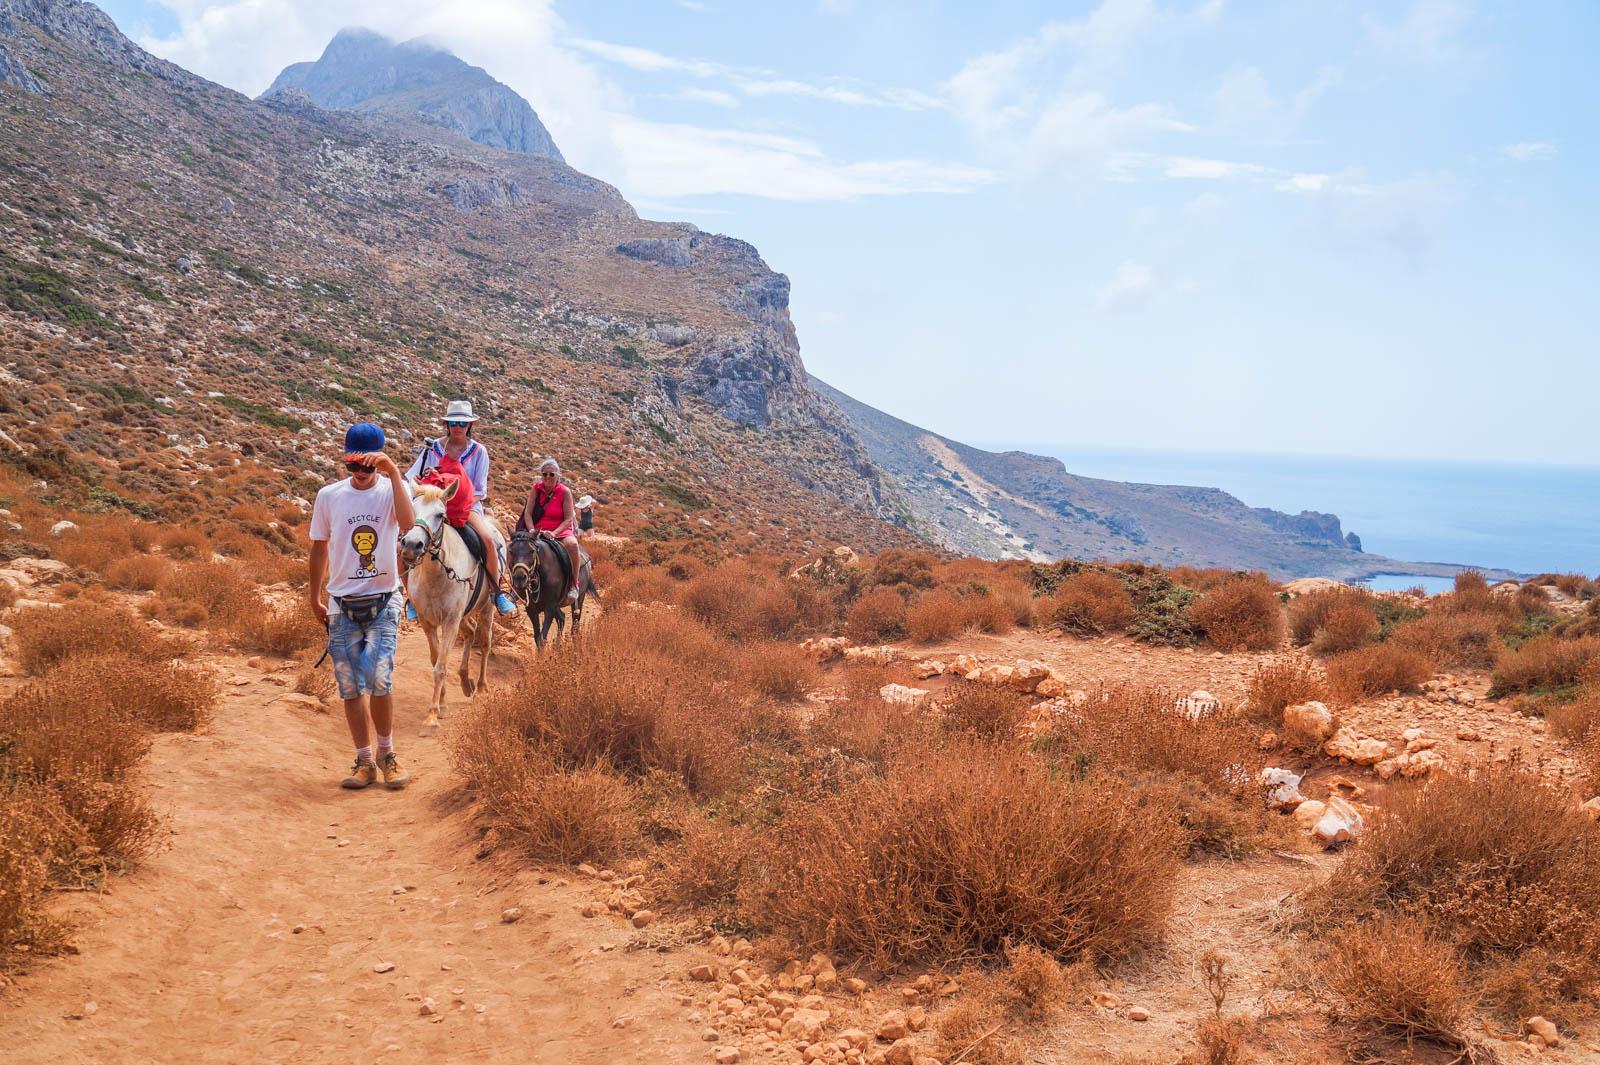 mpalos-beach-crete-greece-la-vie-en-blog-all-rights-reserved-5